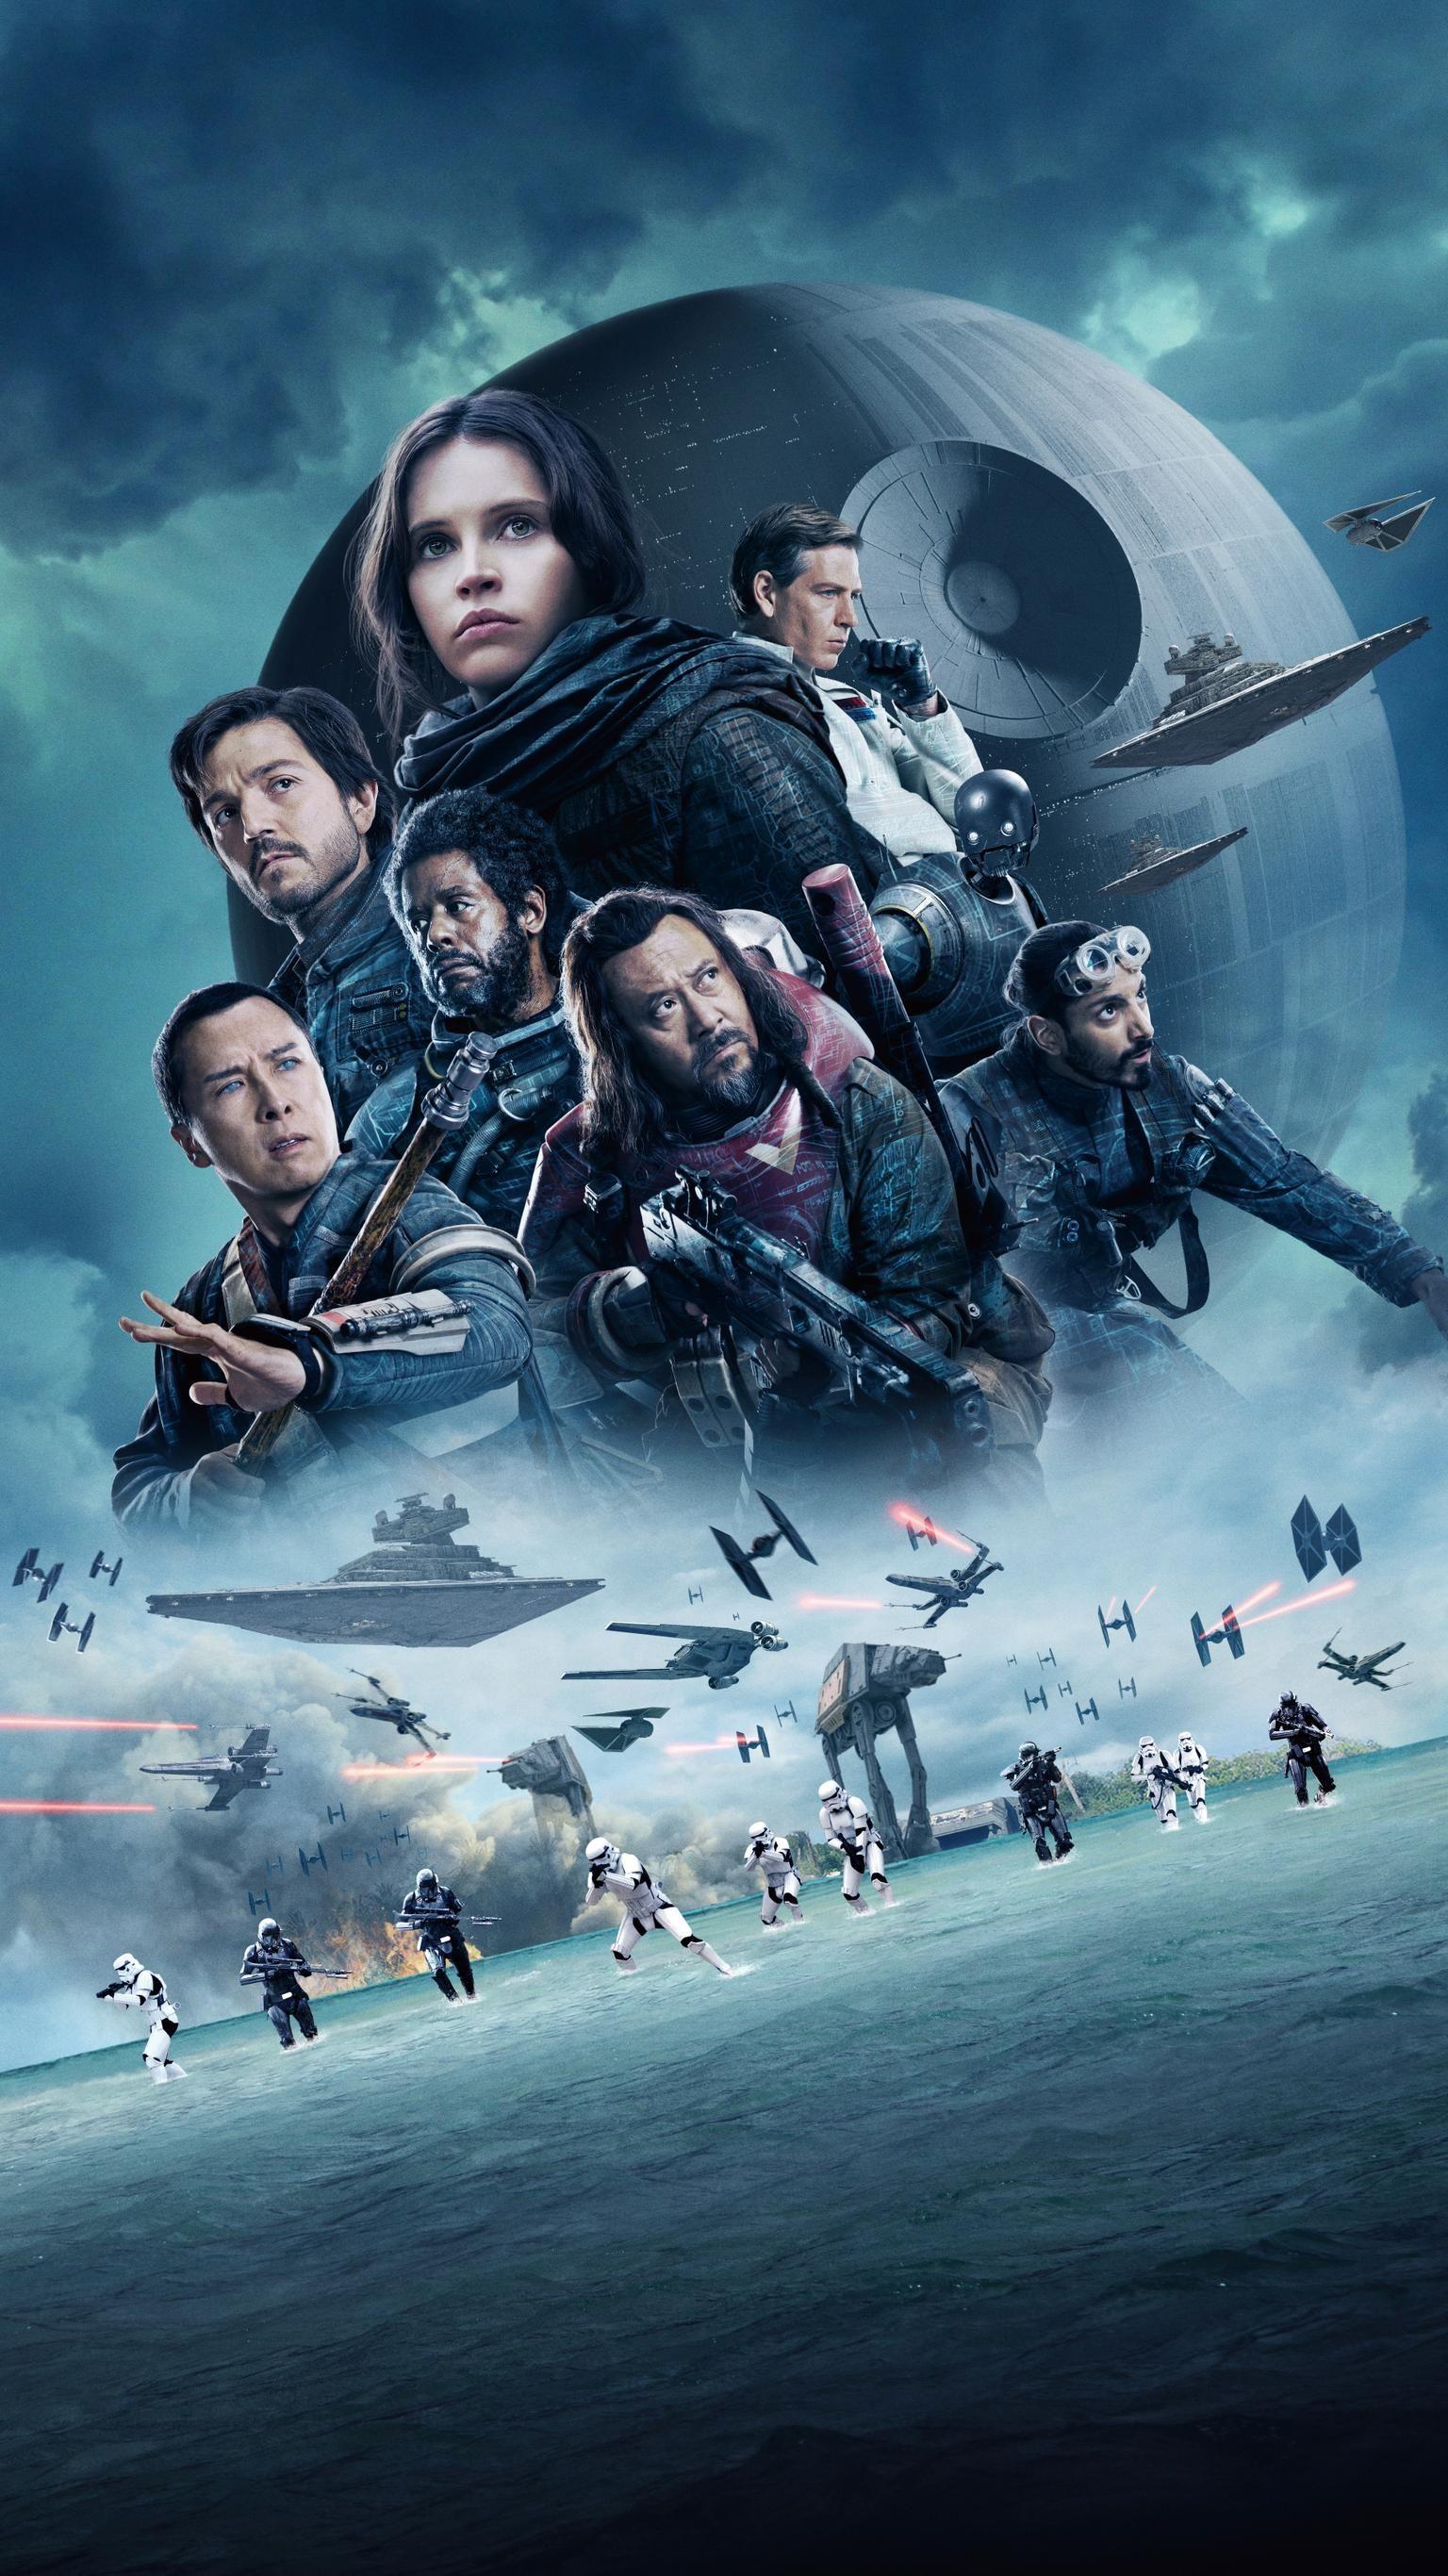 Rogue One A Star Wars Story 2016 Phone Wallpaper Moviemania Rogue One Star Wars Star Wars Movies Posters Star Wars Wallpaper